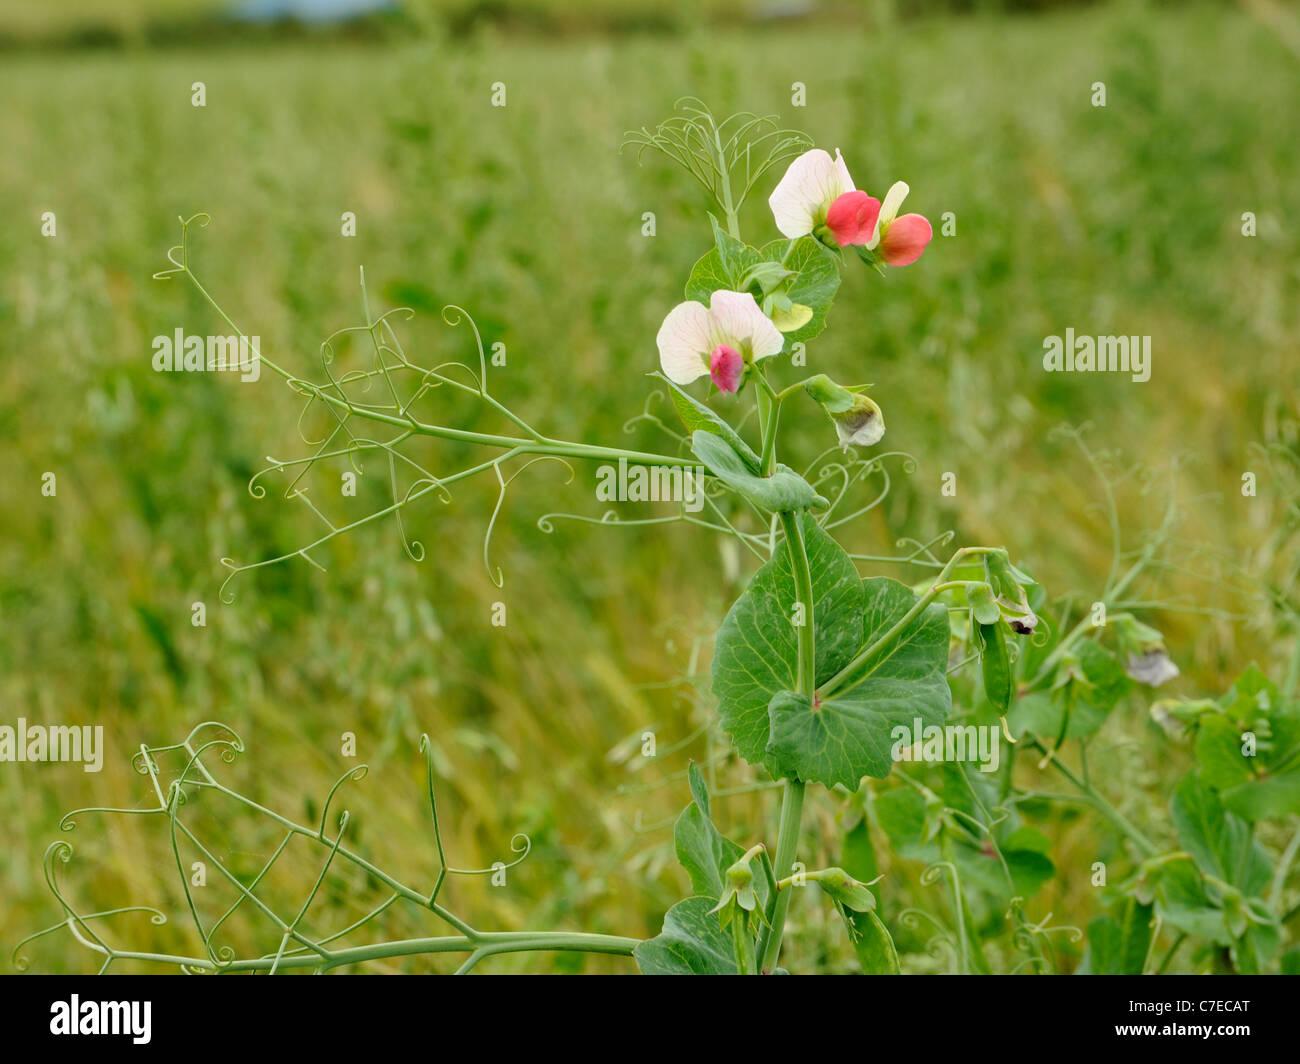 Garden Pea, pisum sativum growing as a weed in an arable field. - Stock Image